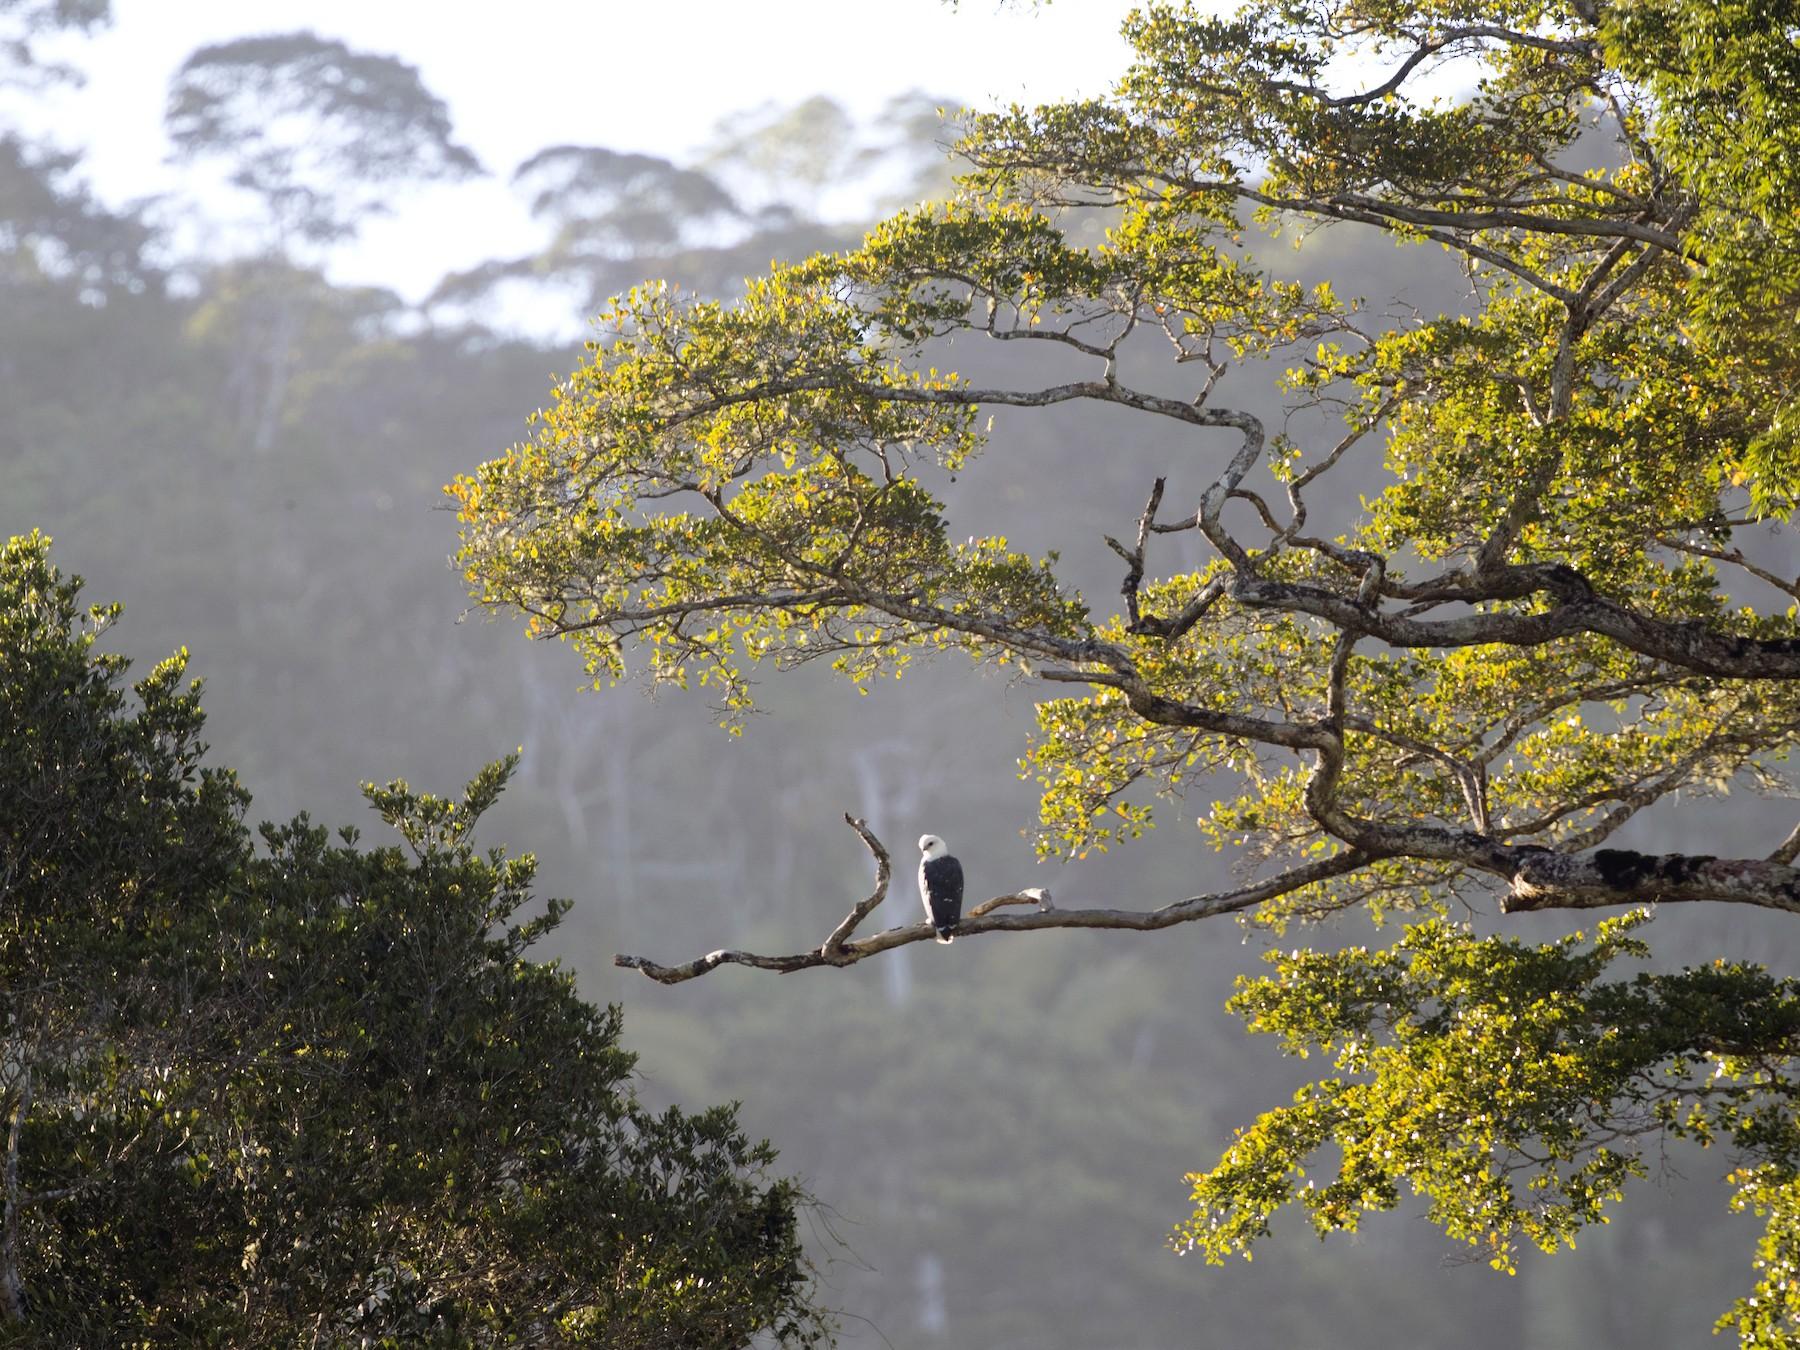 Mantled Hawk - Ciro Albano